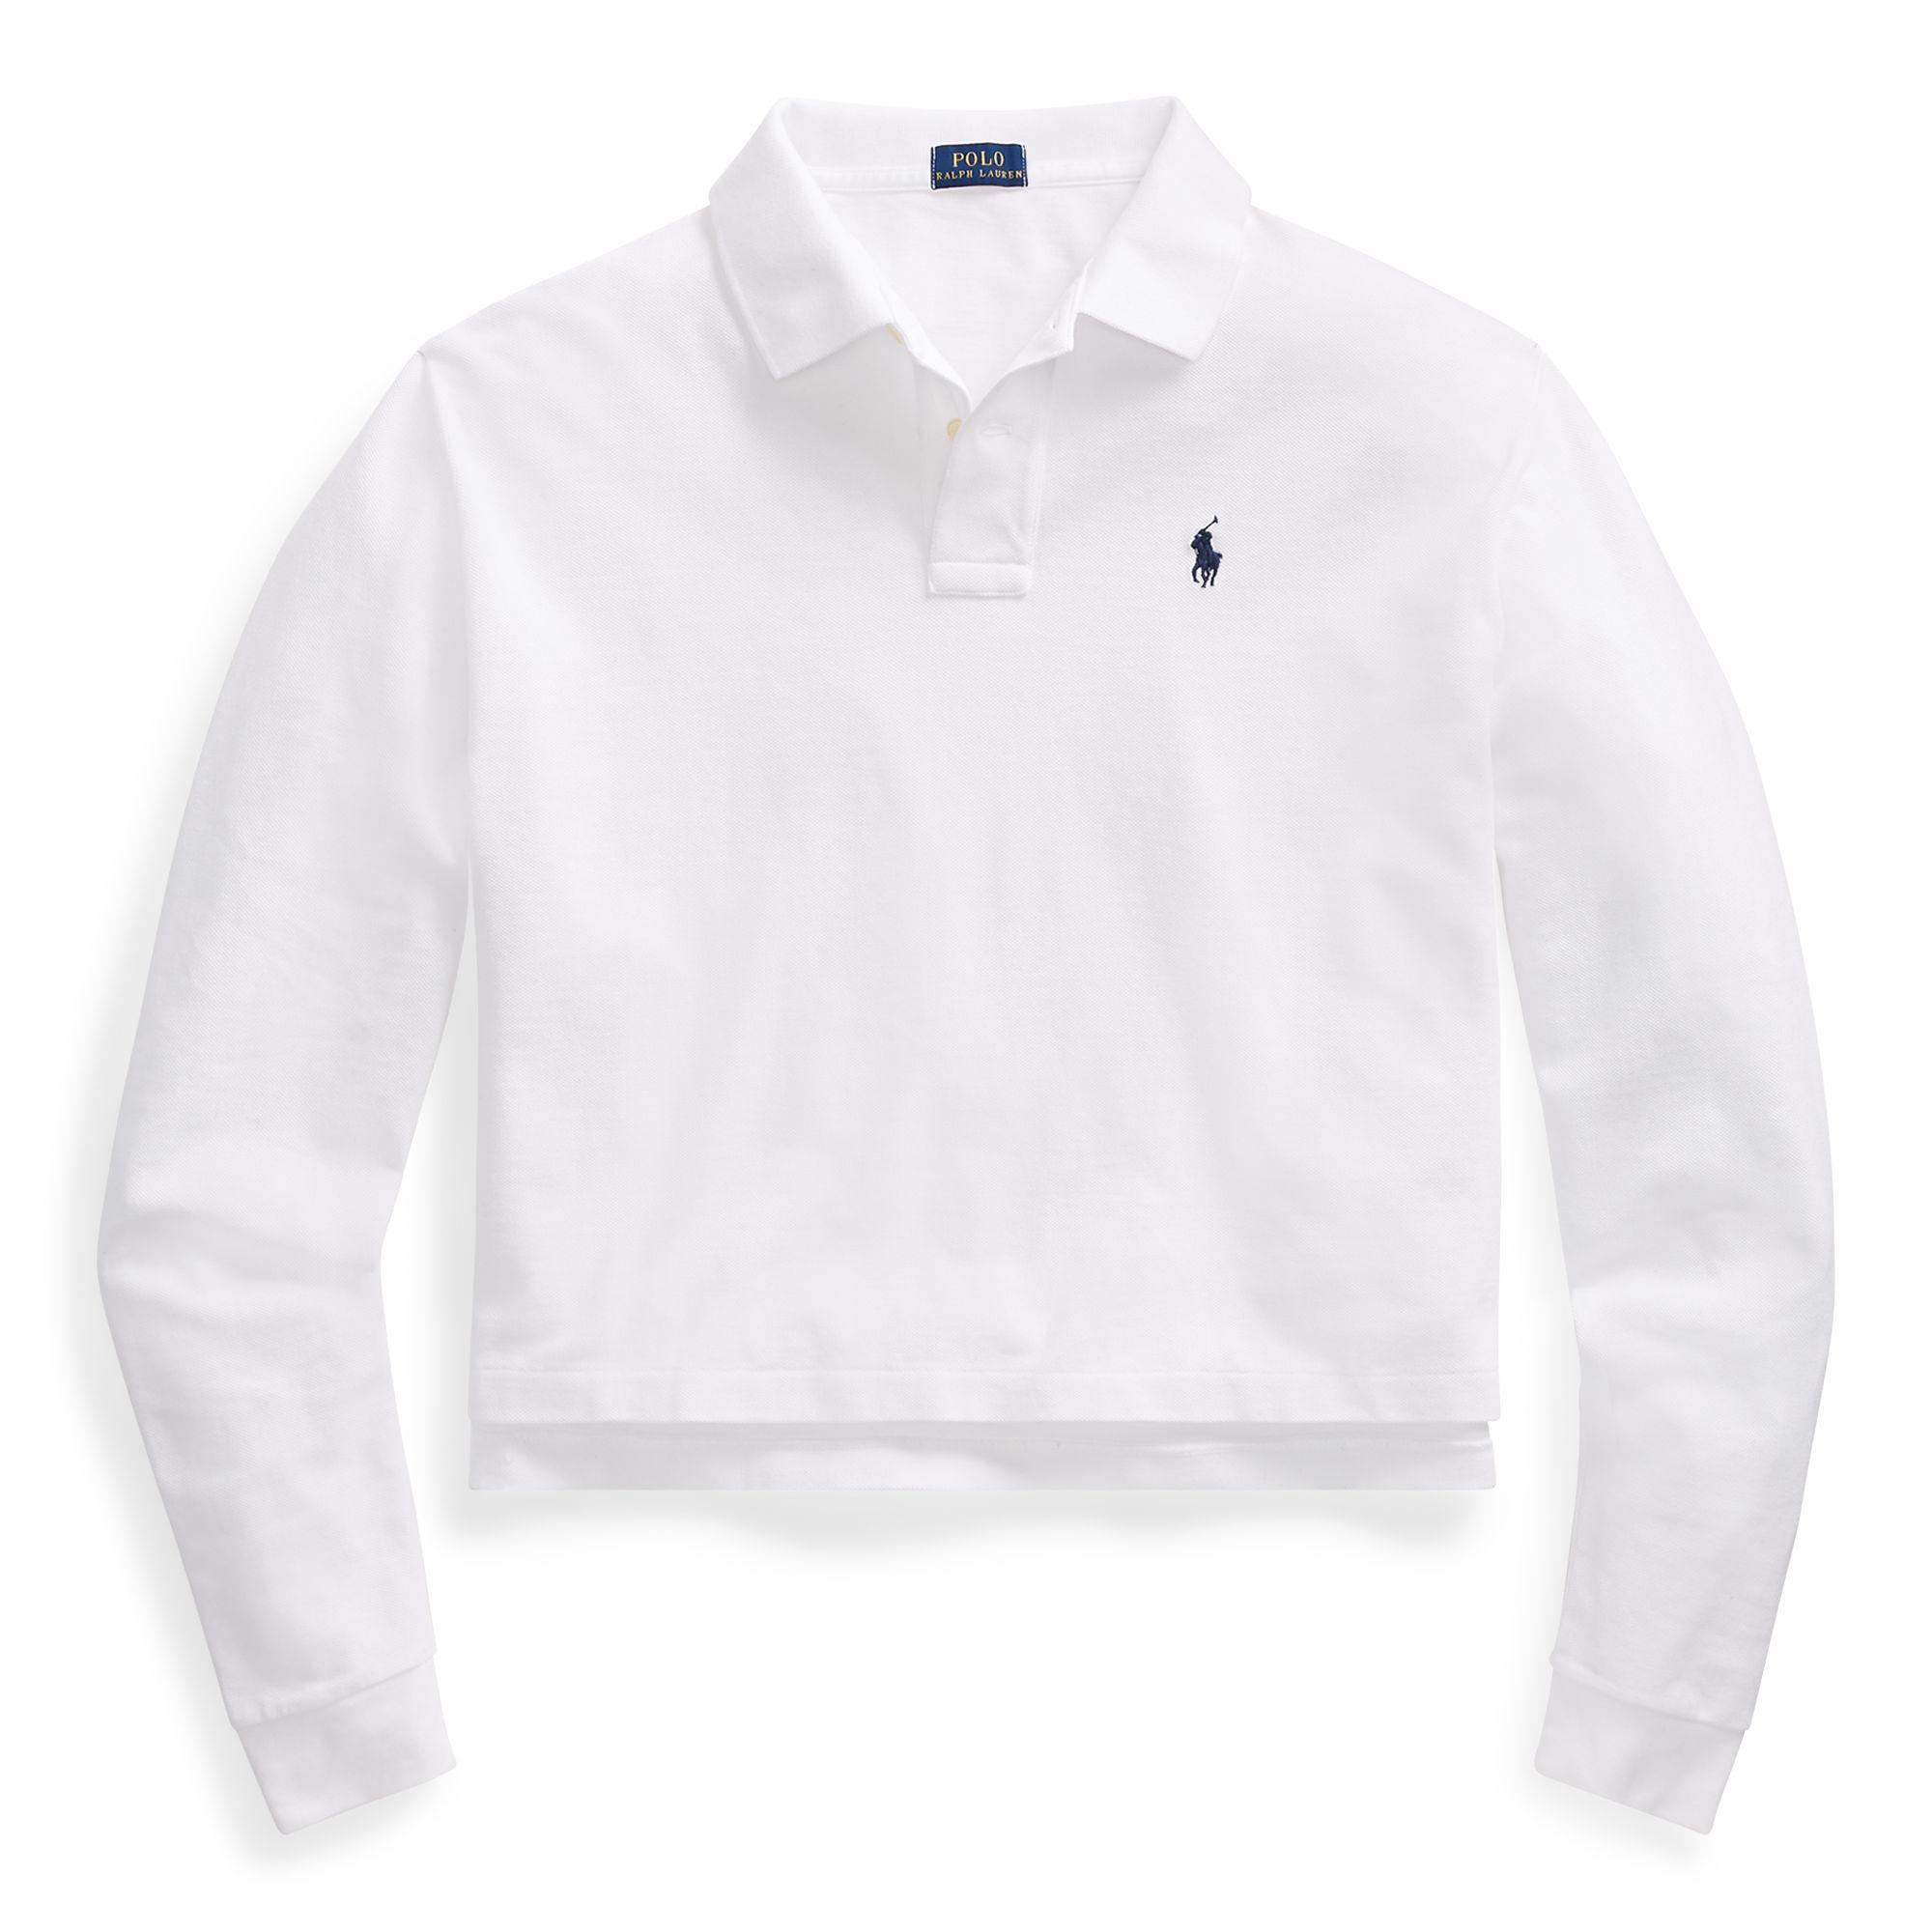 1cd85d1b531 Polo Ralph Lauren - White Cropped Mesh Polo Shirt - Lyst. View fullscreen